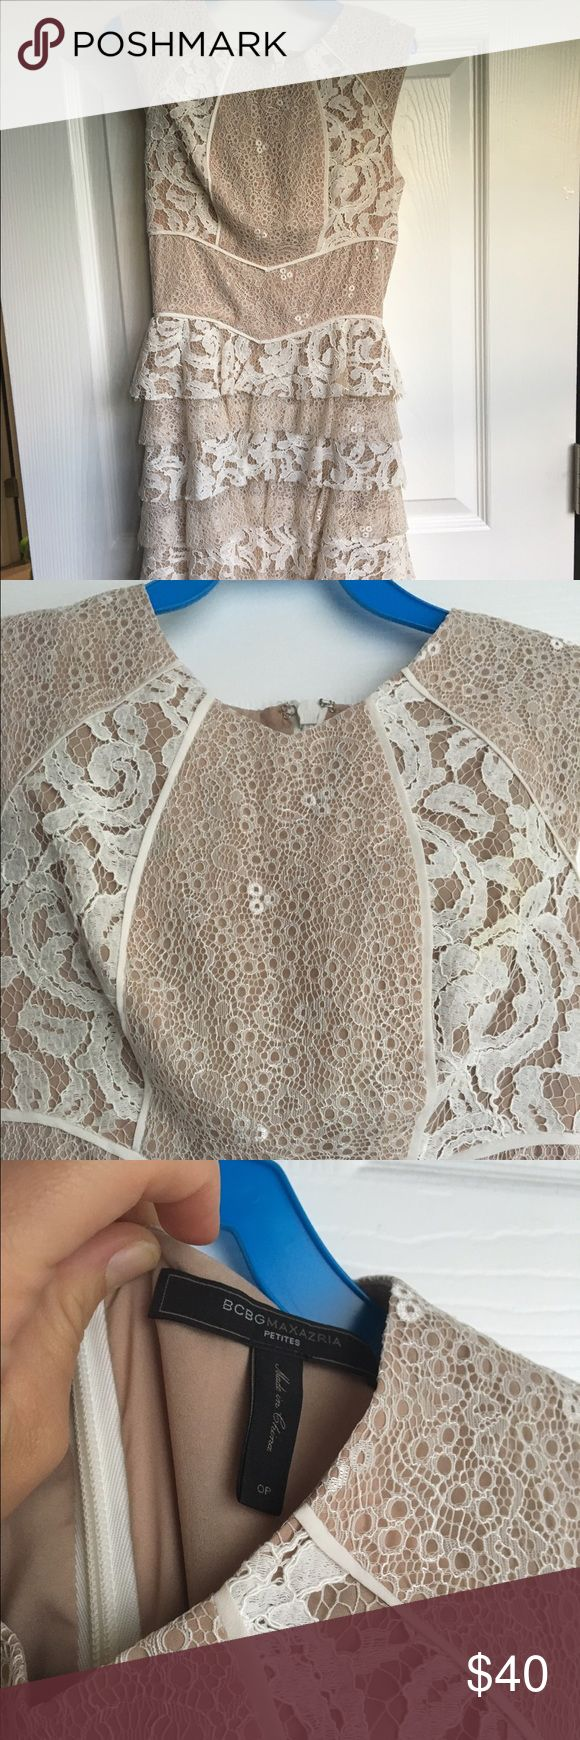 Bcbgmaxazria white and nude laci dress petite So gorgeous. Wore this to my rehearsal dinner. BCBGMaxAzria Dresses Mini